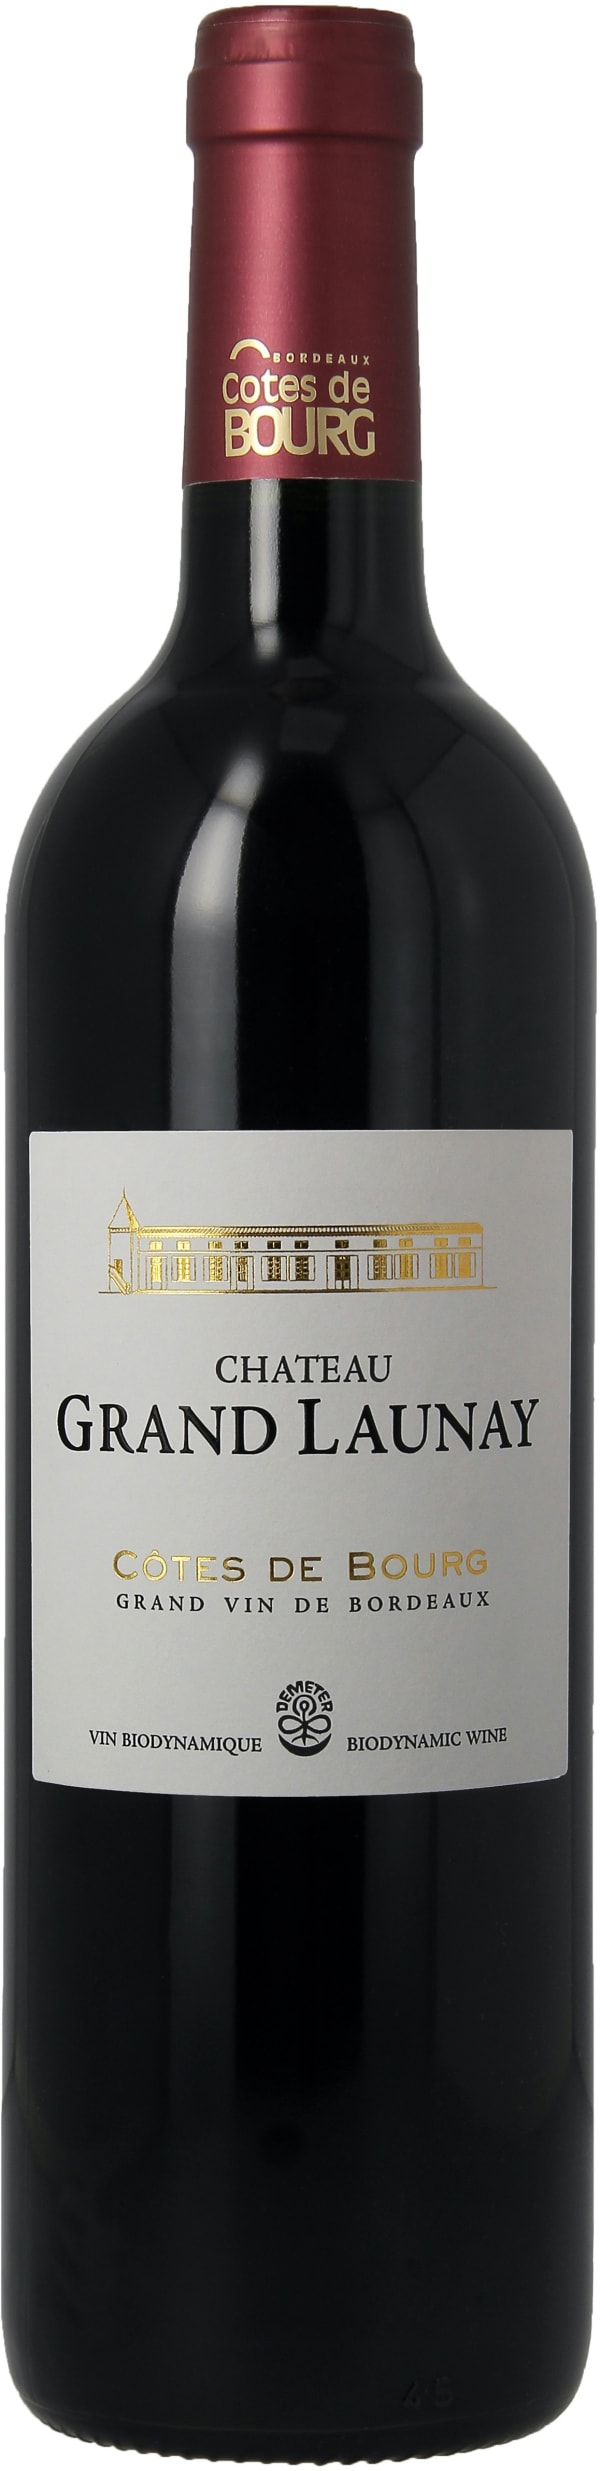 Château Grand Launay 2015